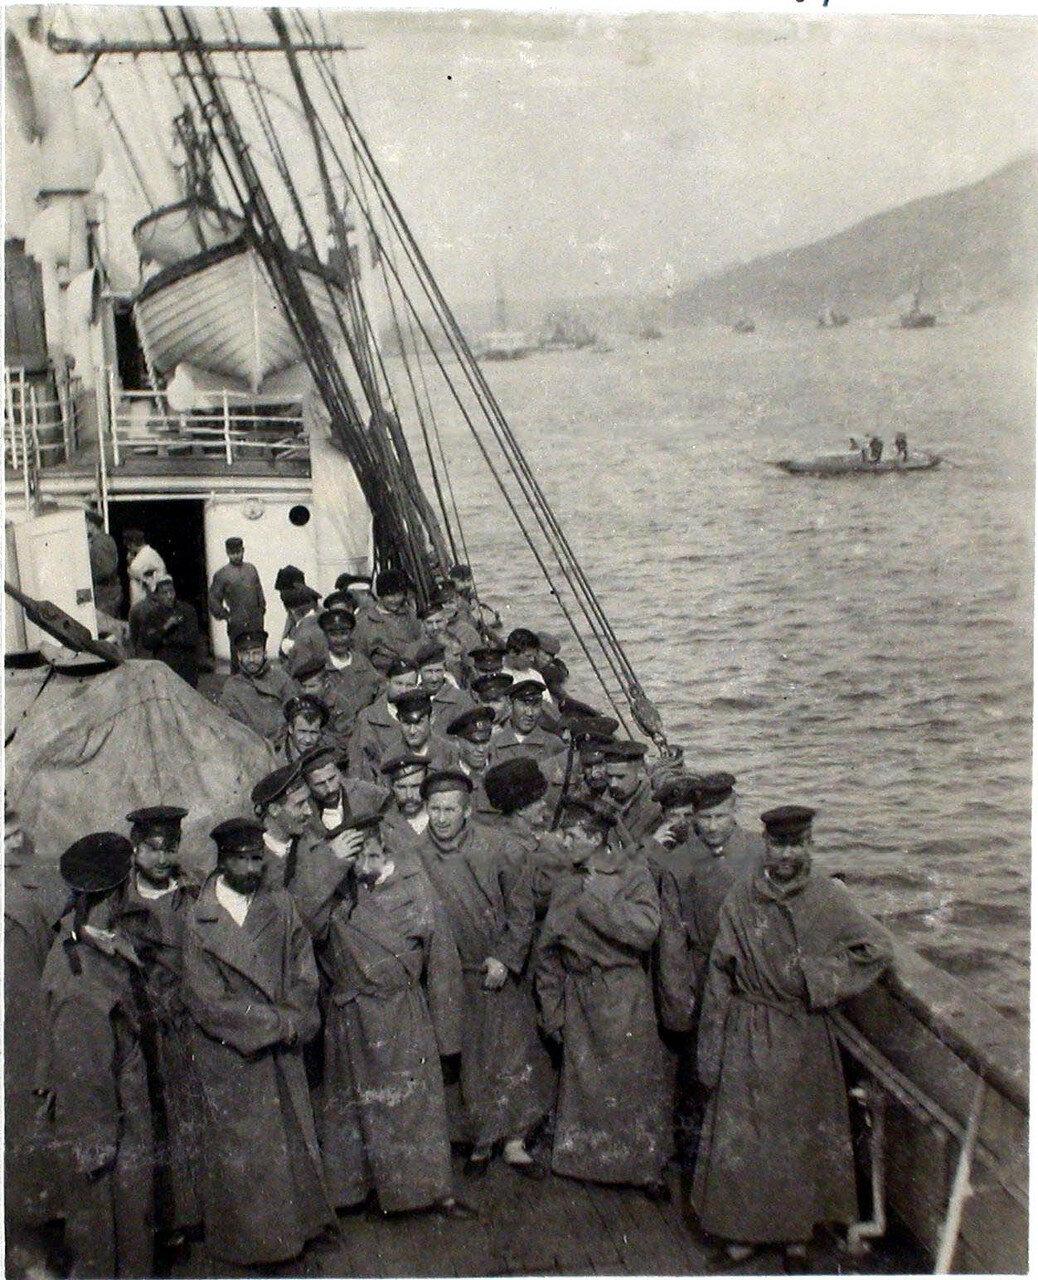 32. Больные на палубе парохода «Царица». Япония, Иокогама. 1901